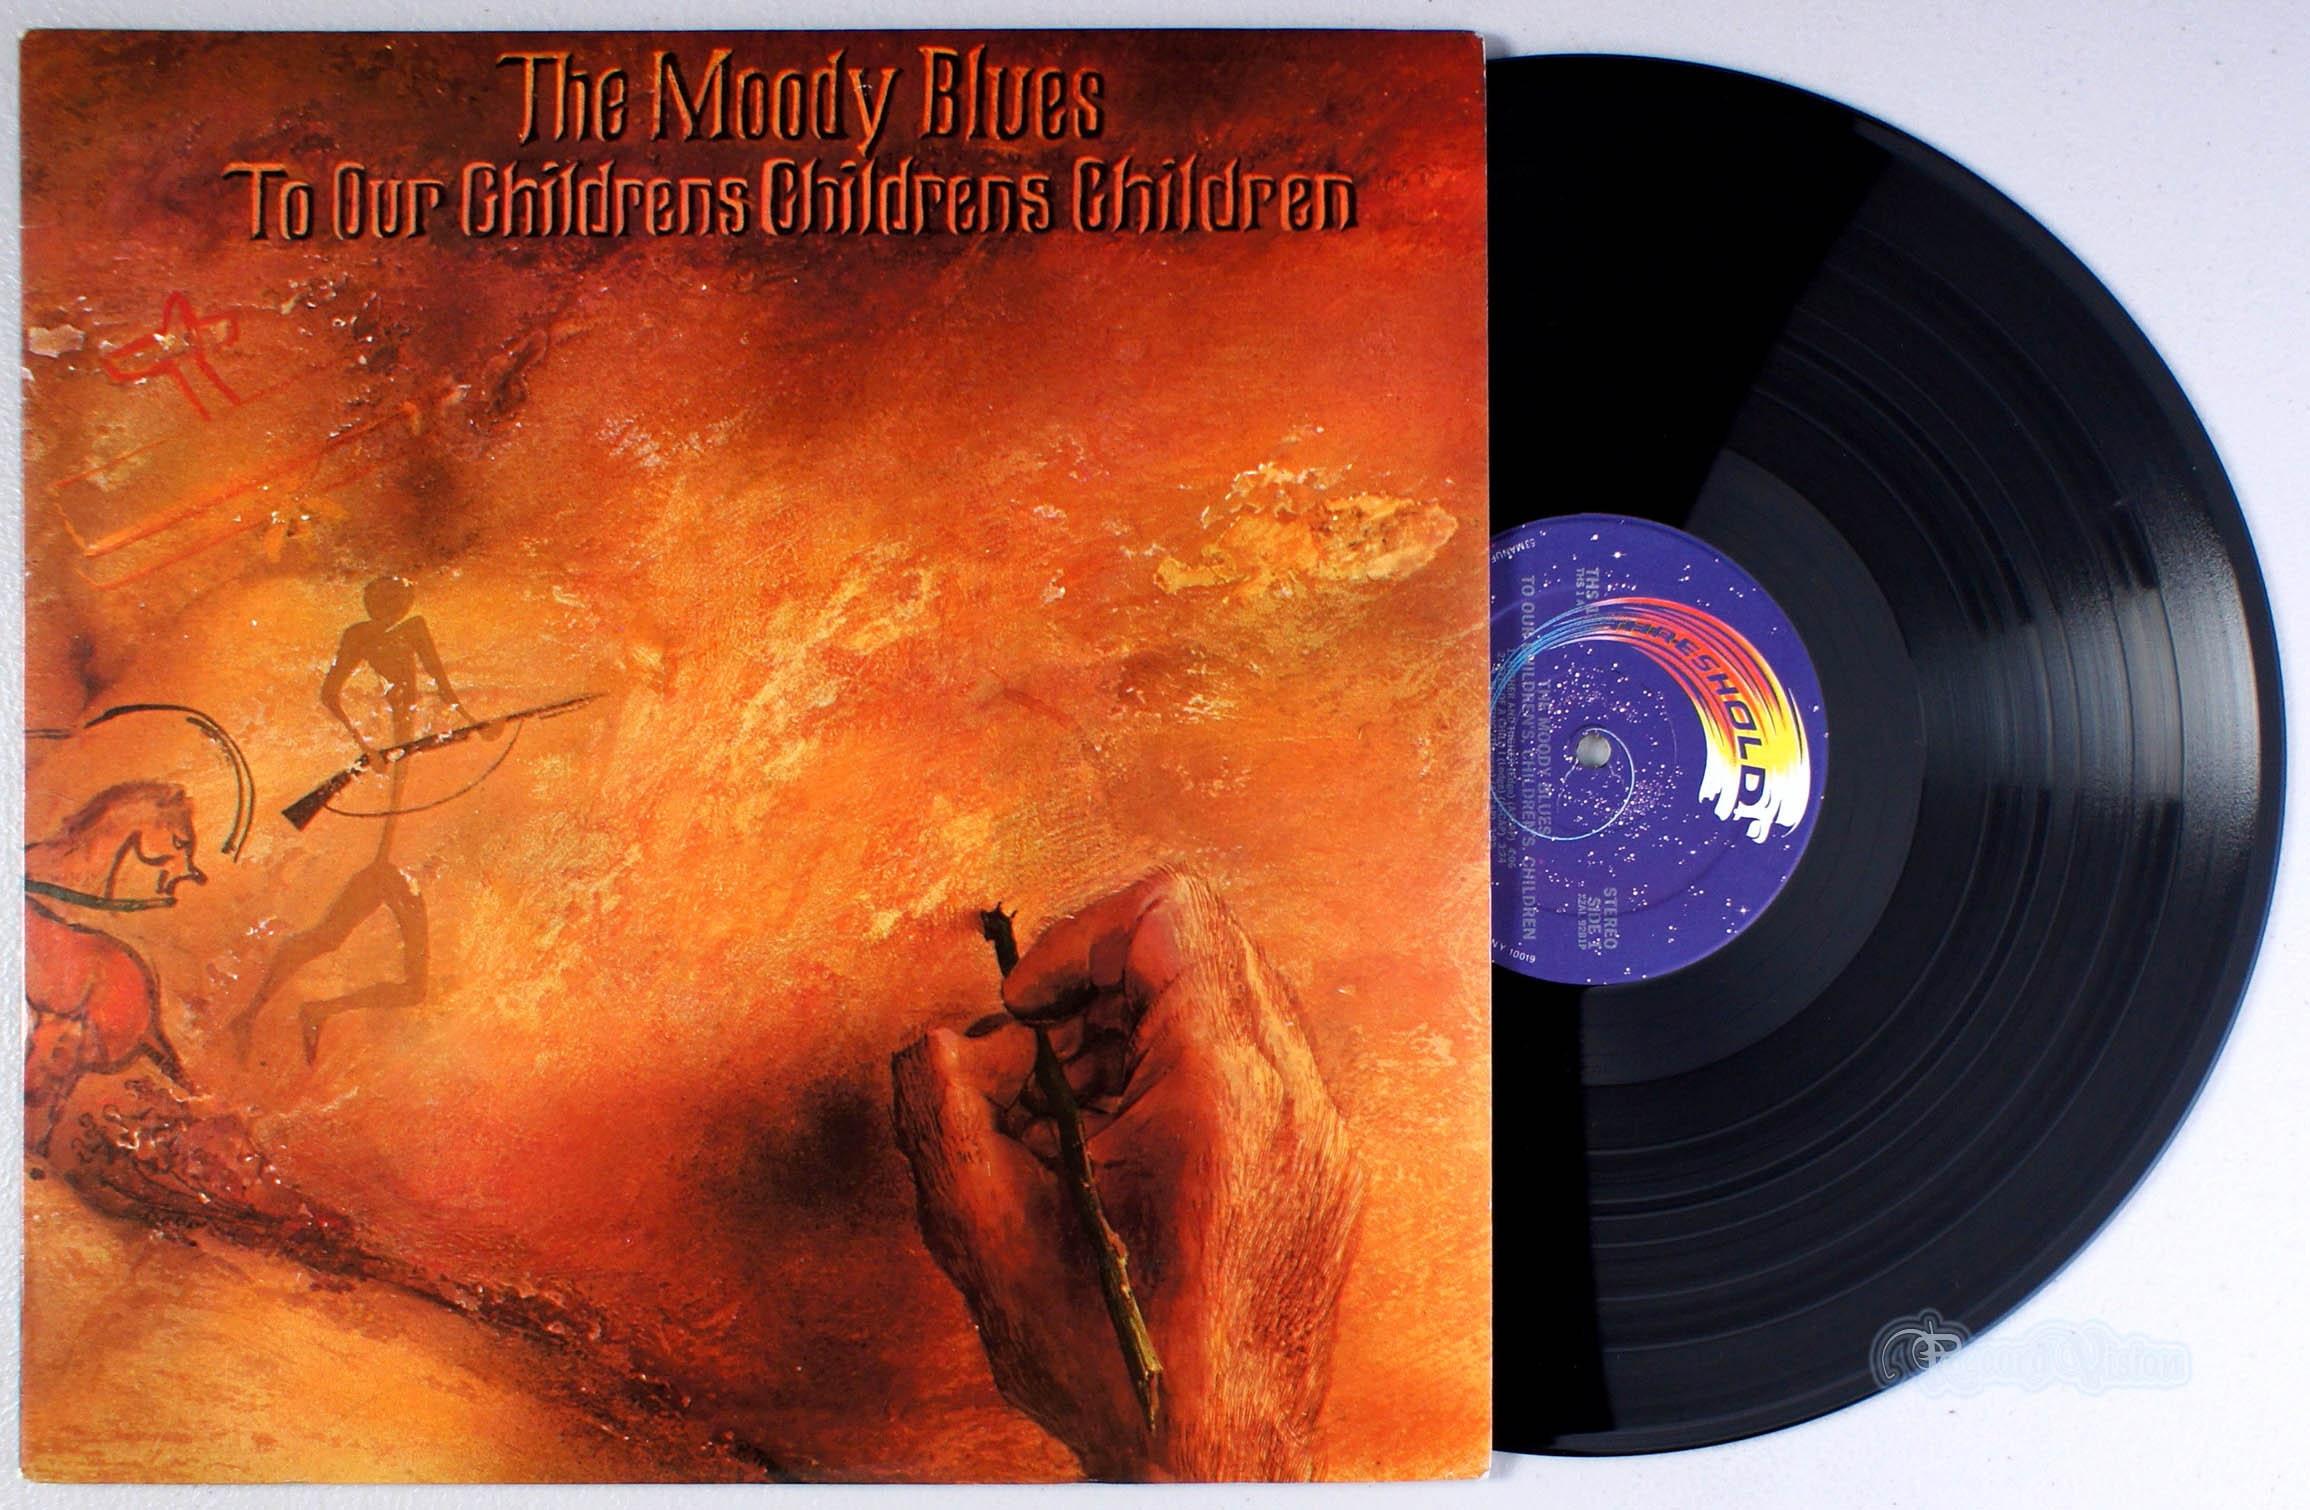 Moody Blues - To Our Children's Children (1969) Vinyl LP